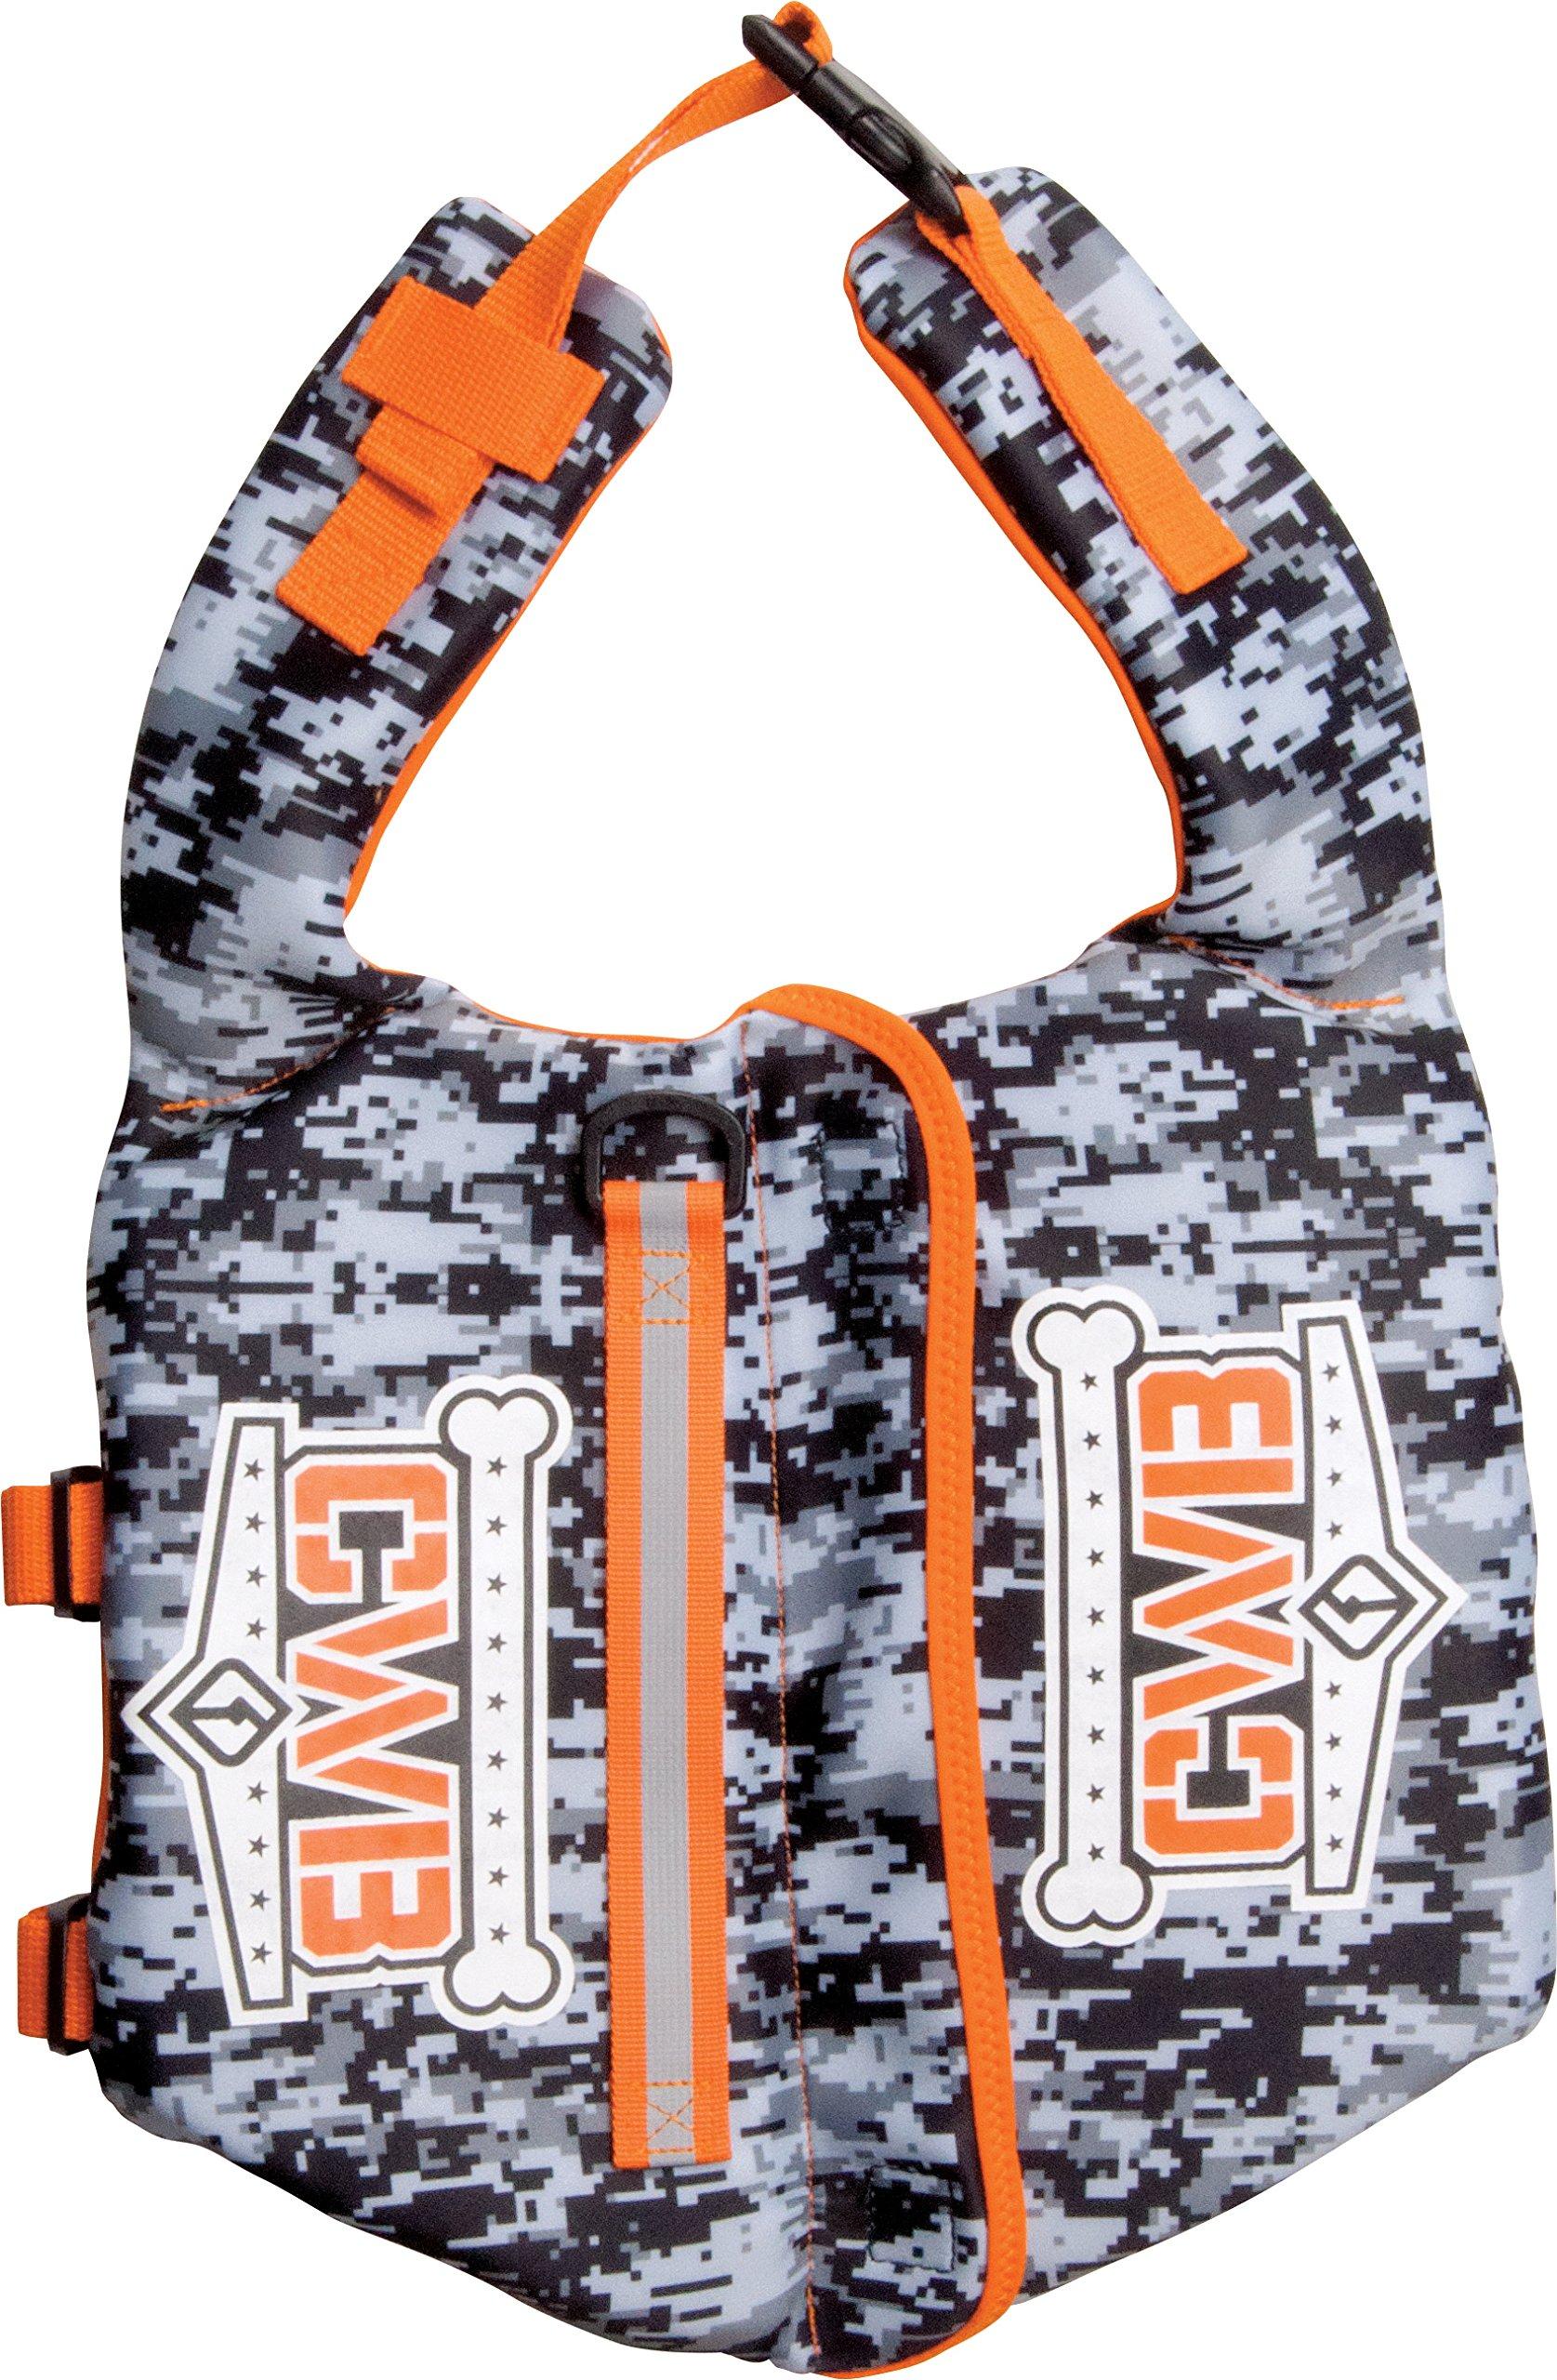 CWB Board Co. Spike Dog Neoprene Vest, XX-Small by CWB